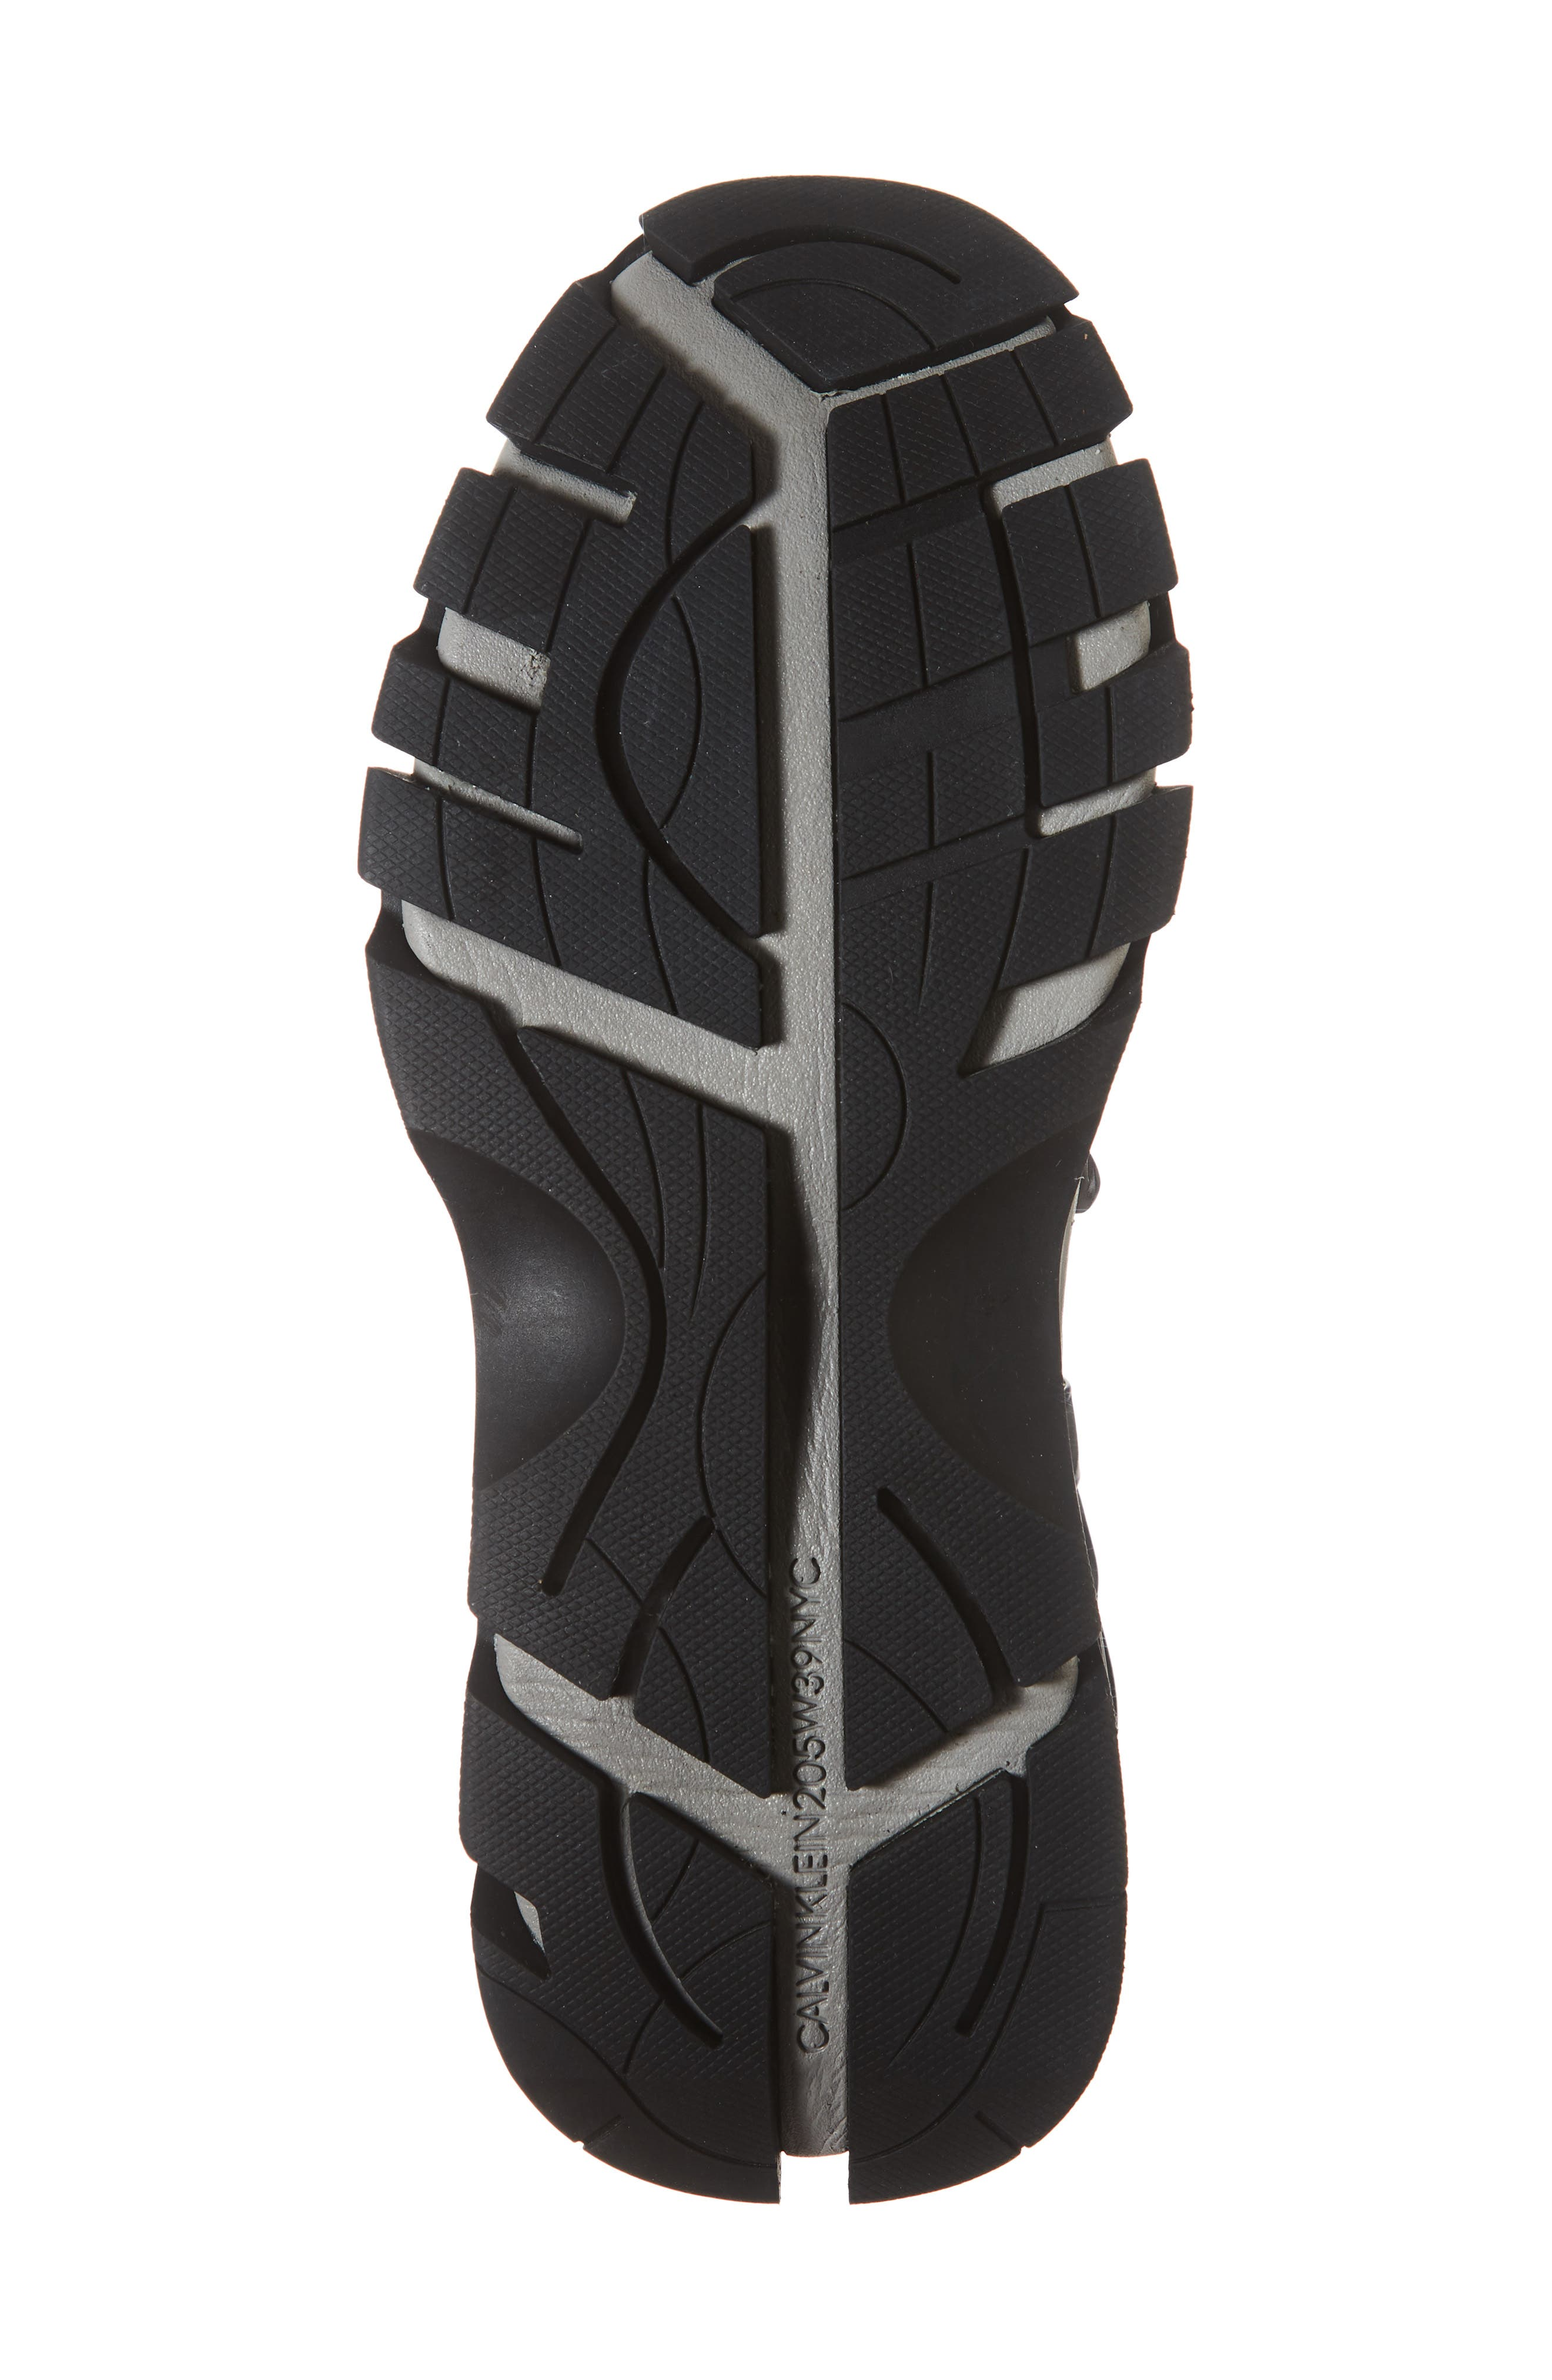 Carsdat 10 Elastic Sneaker,                             Alternate thumbnail 6, color,                             BLACK